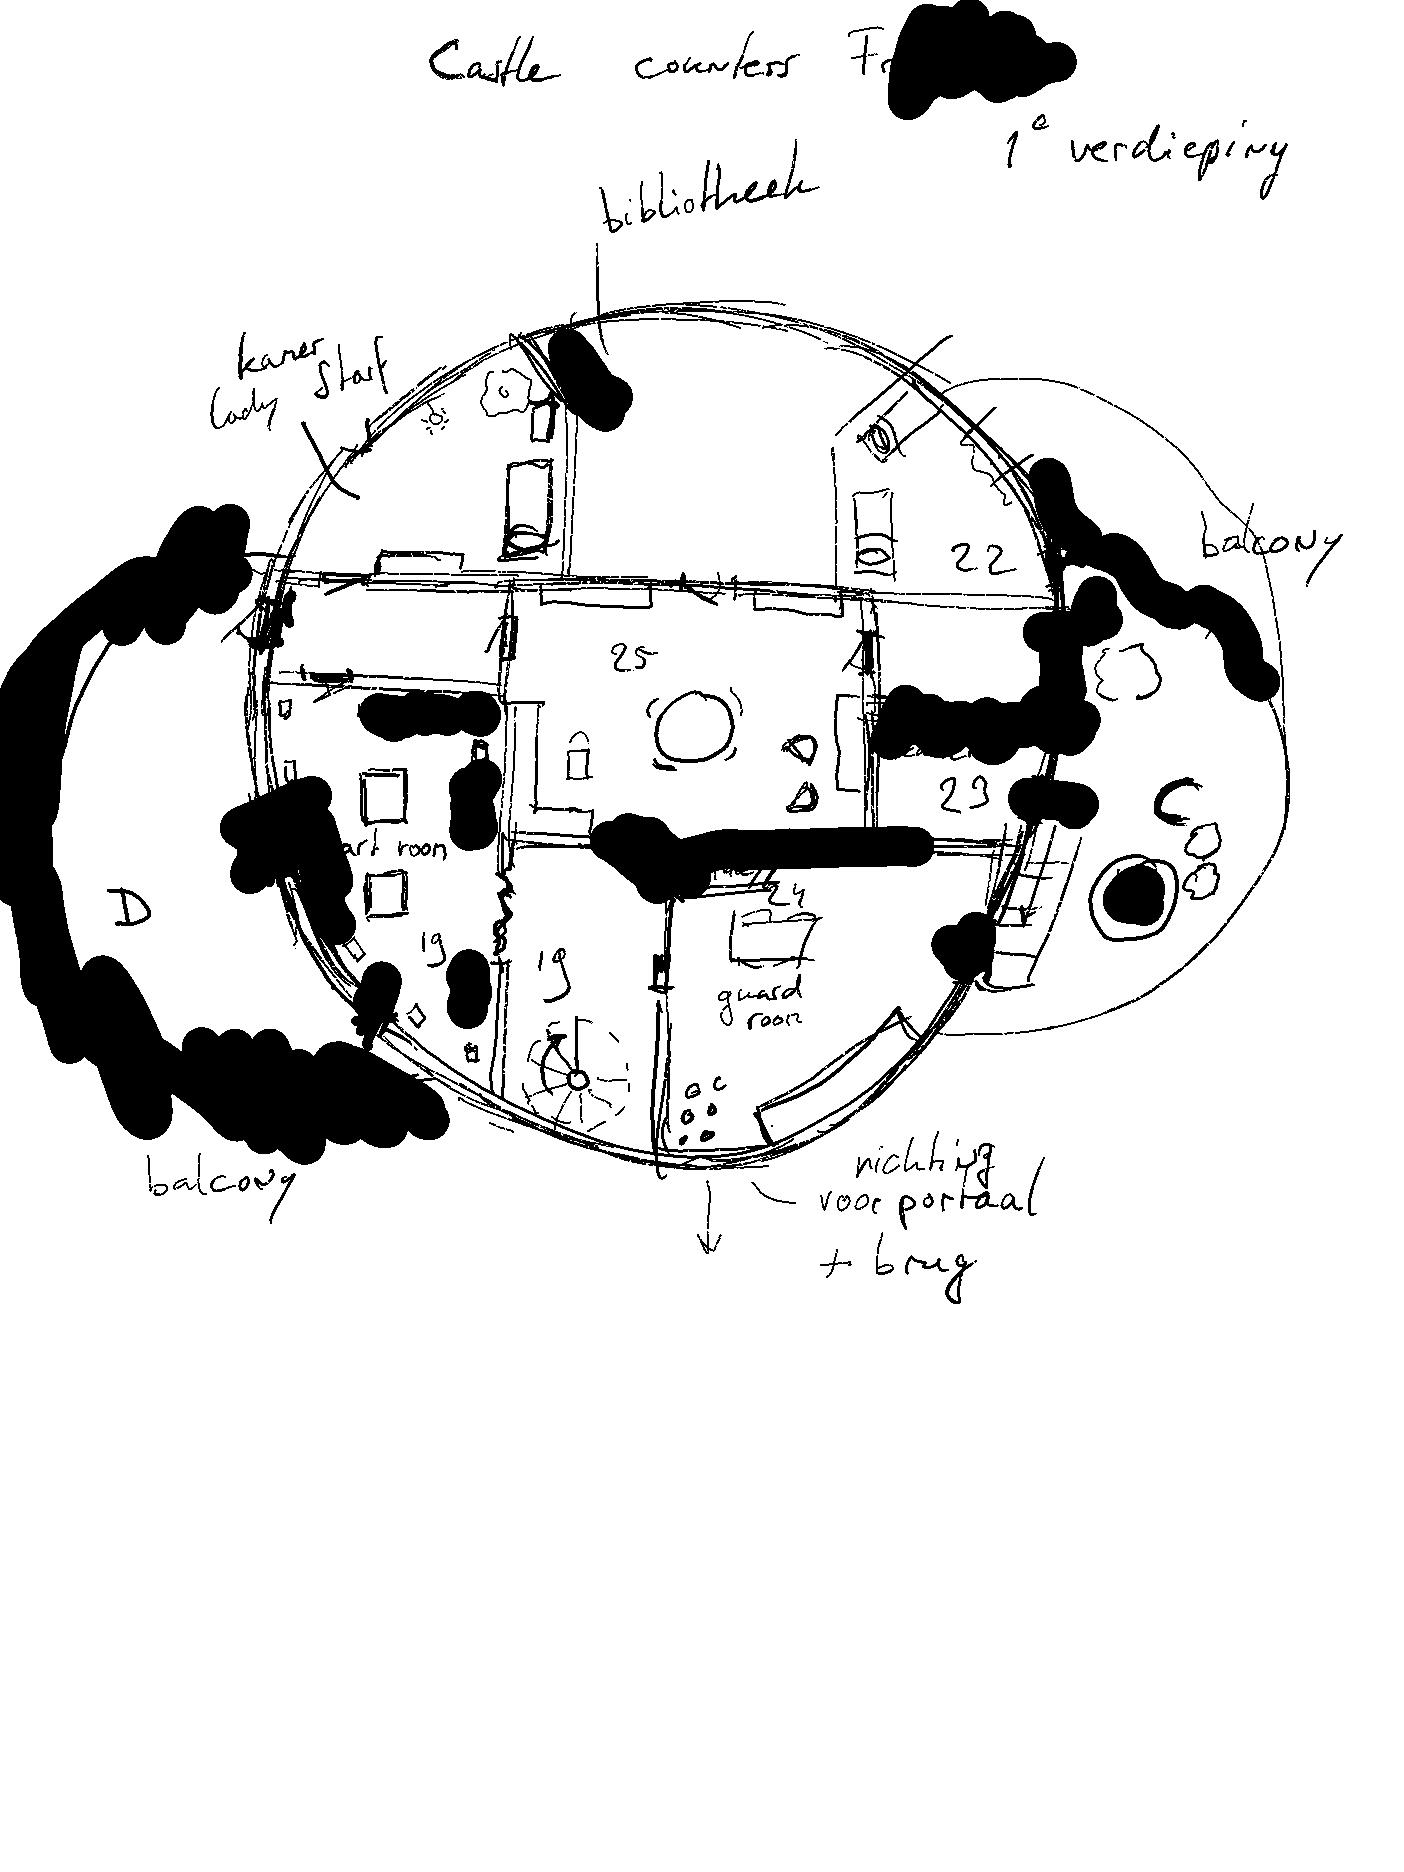 Maps_-_castle_Frostbite_1st_floor.png